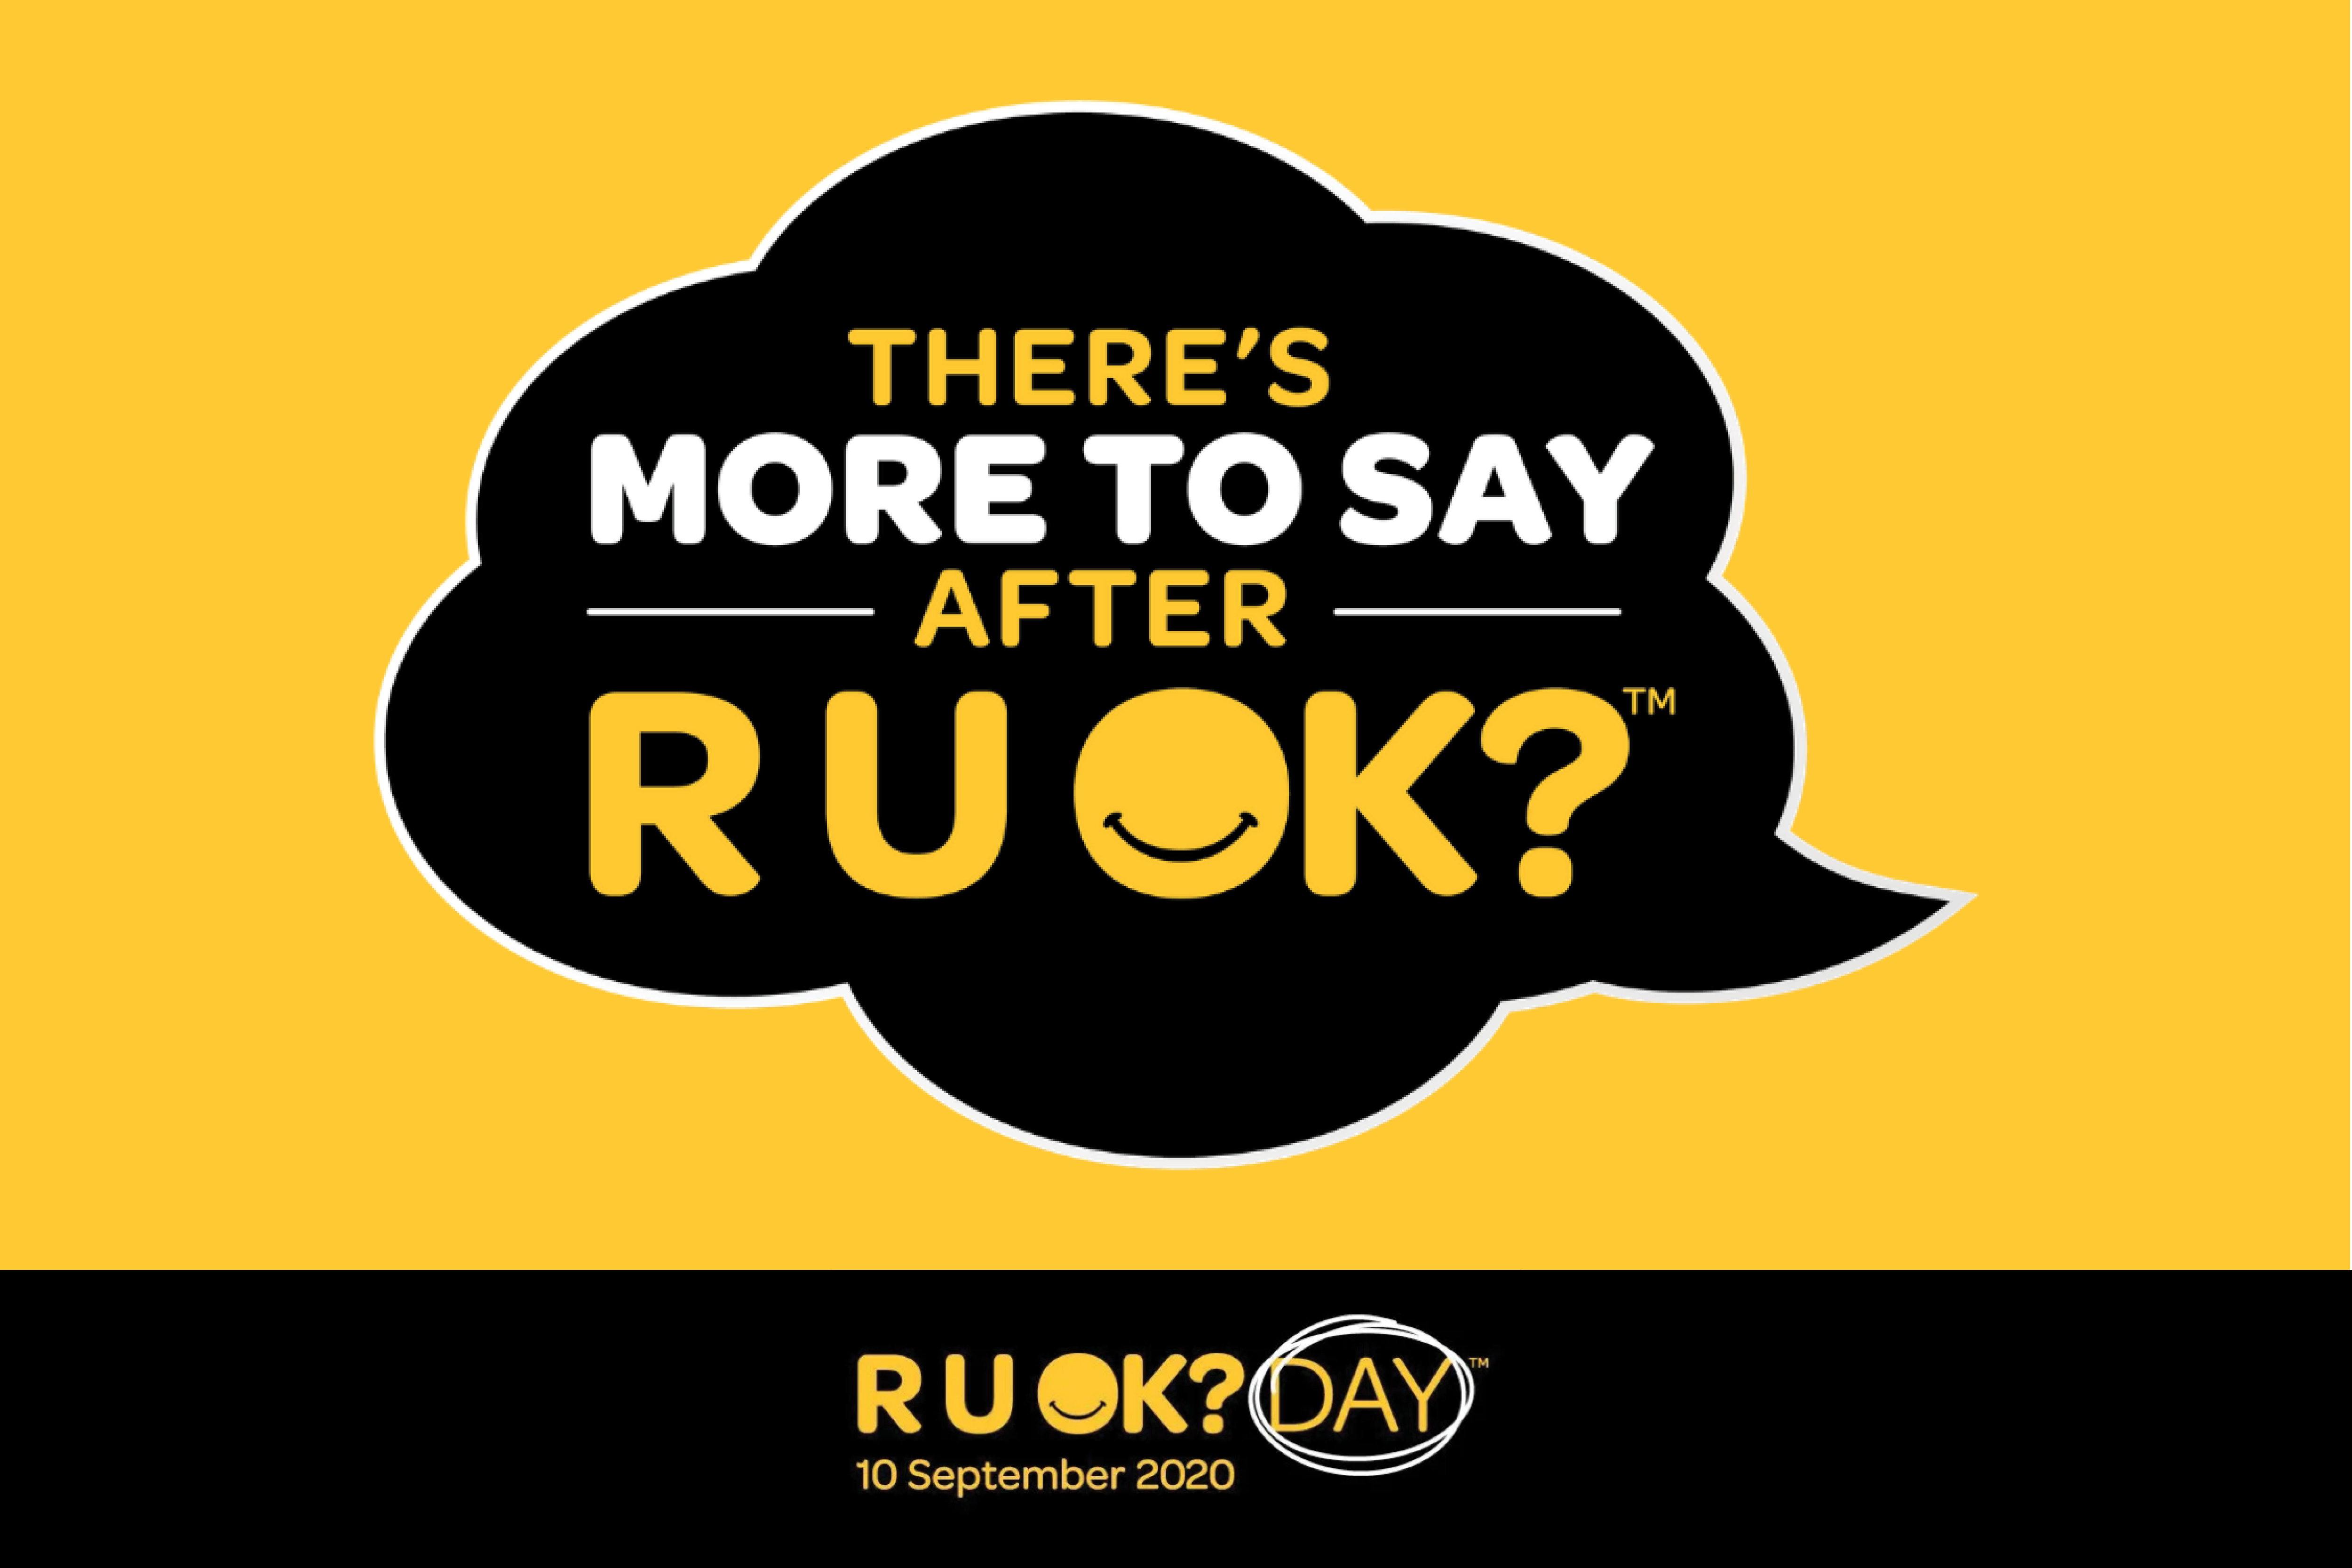 R U OK? DAY